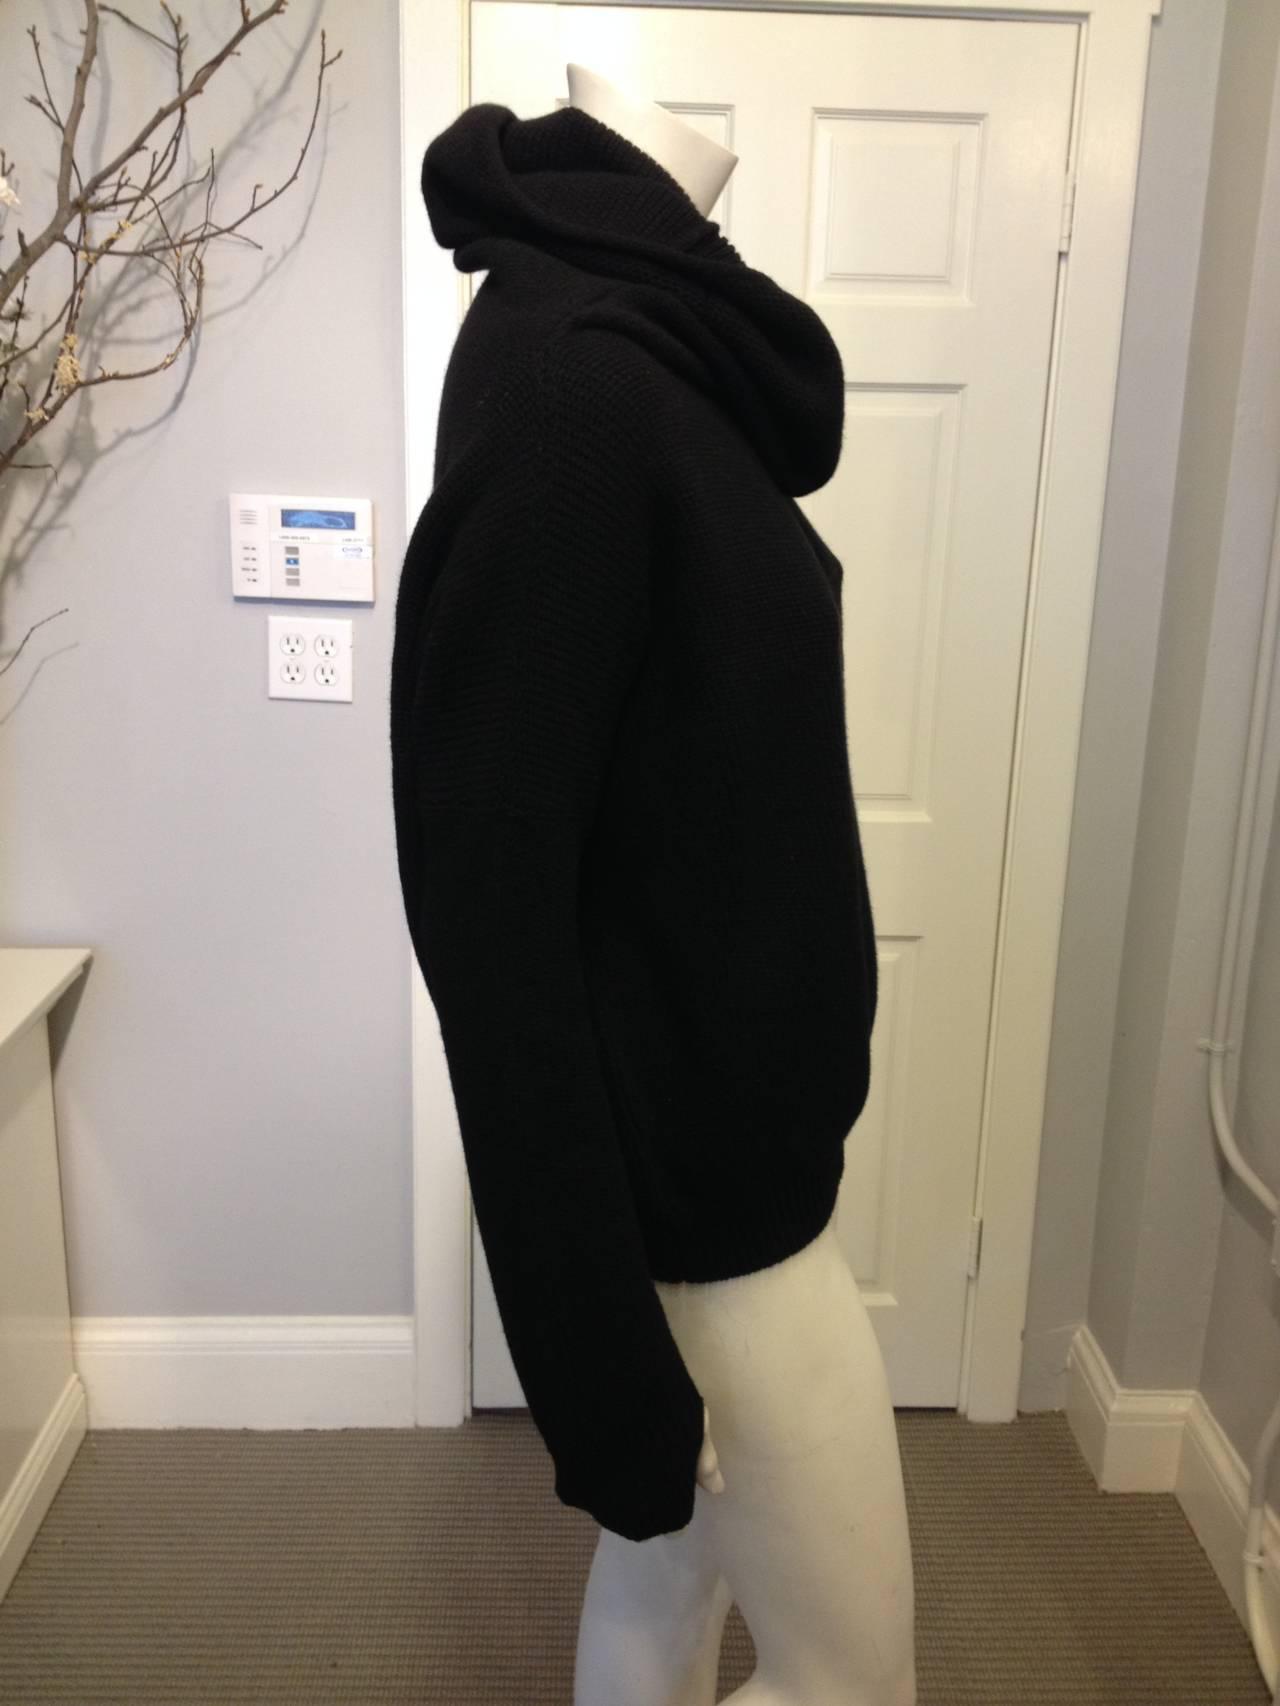 Hermes Black Turtleneck Sweater 2